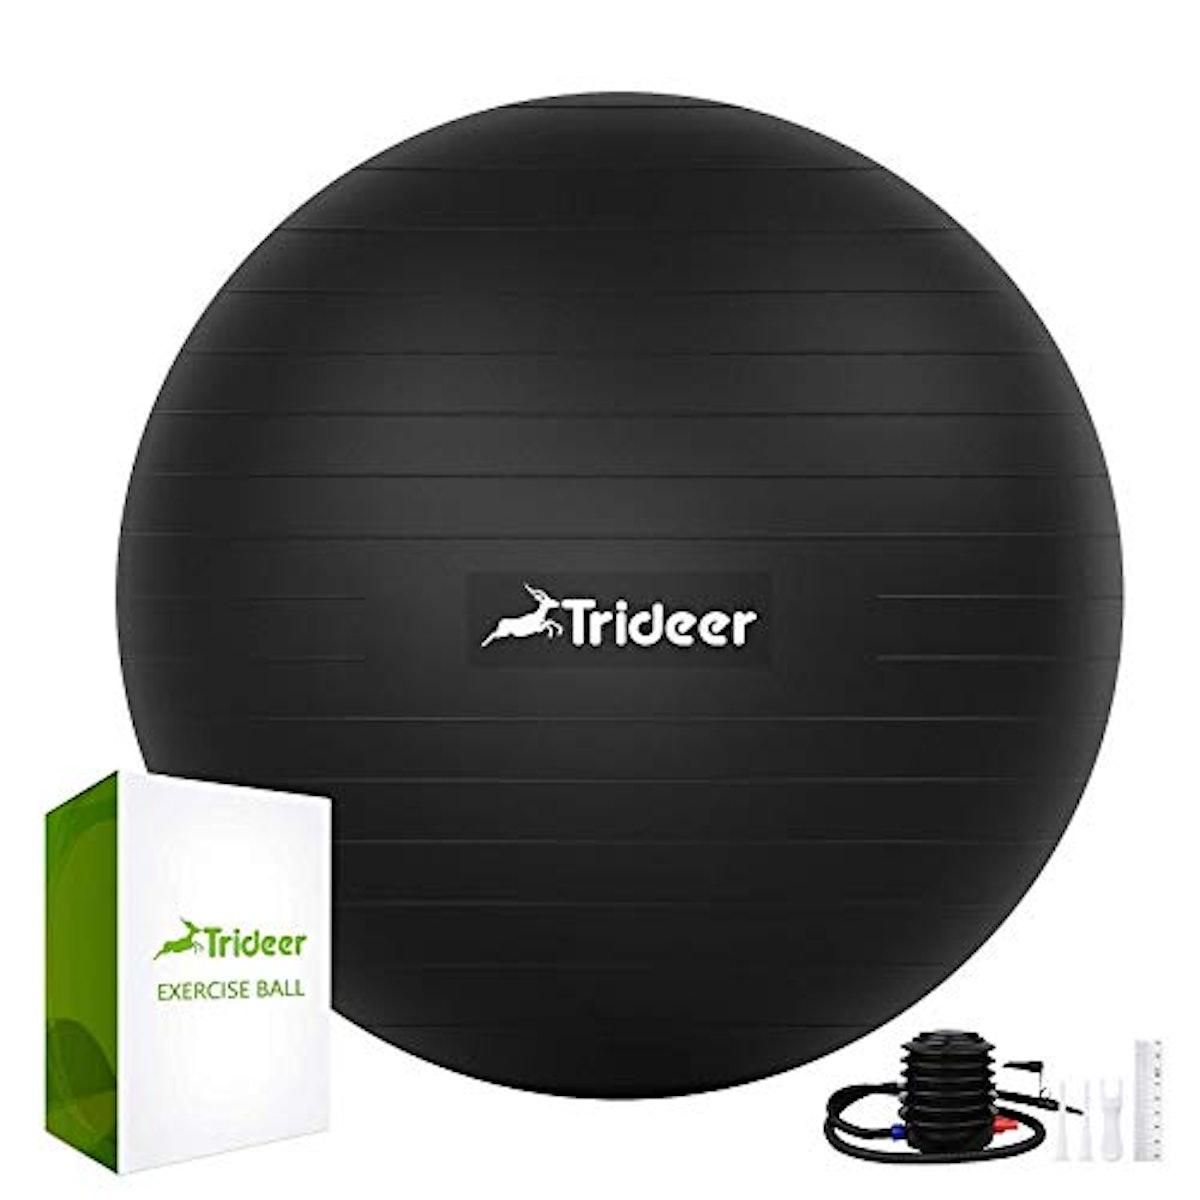 Trideer Exercise Ball (45-85cm)